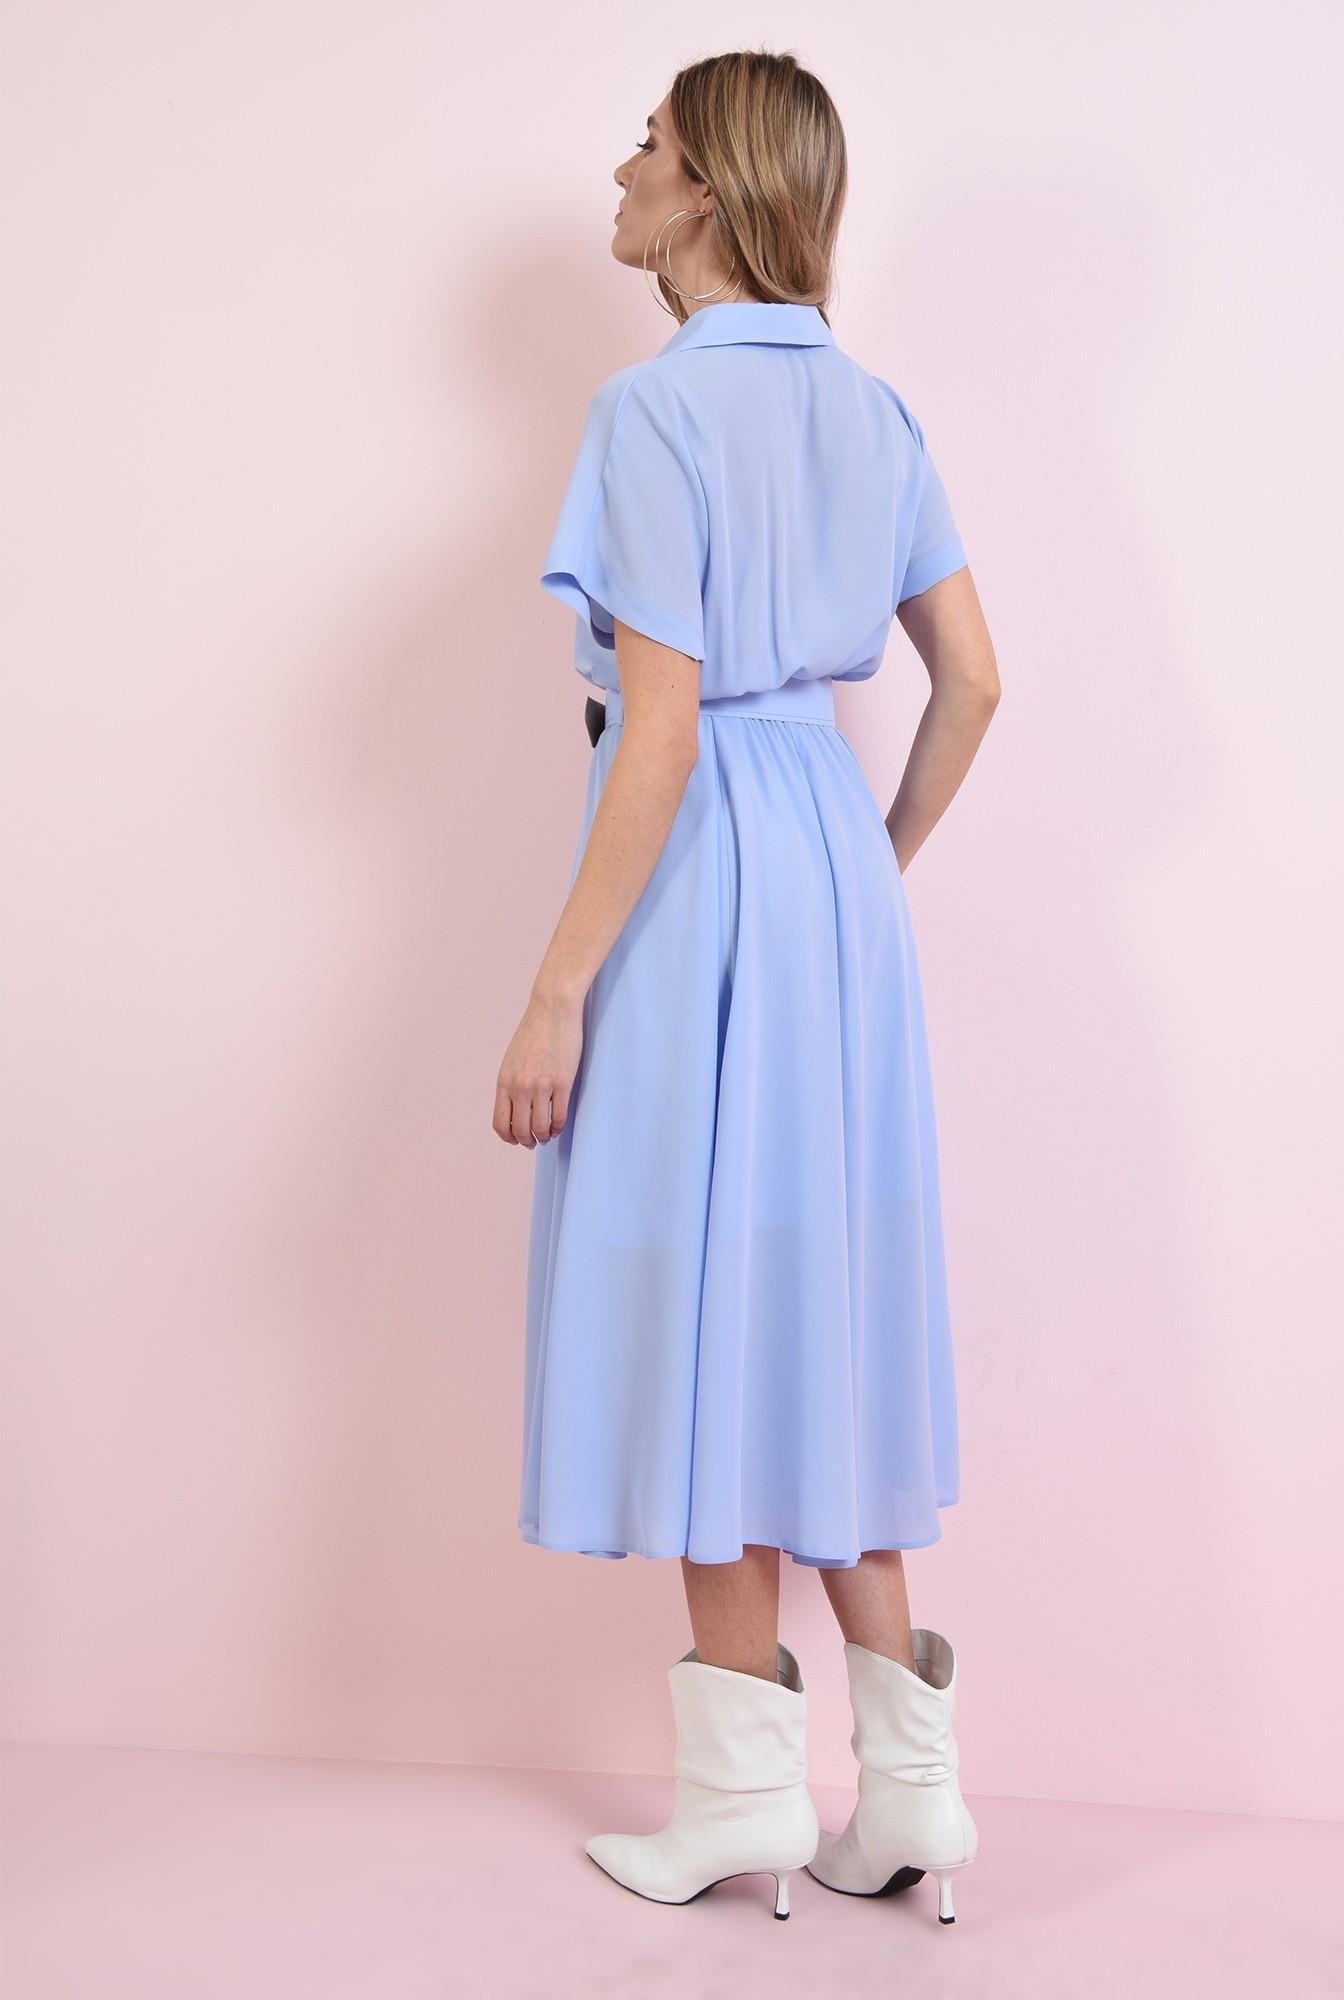 1 - 360 - rochie midi, bleu, 3/4, maneci raglan, centura